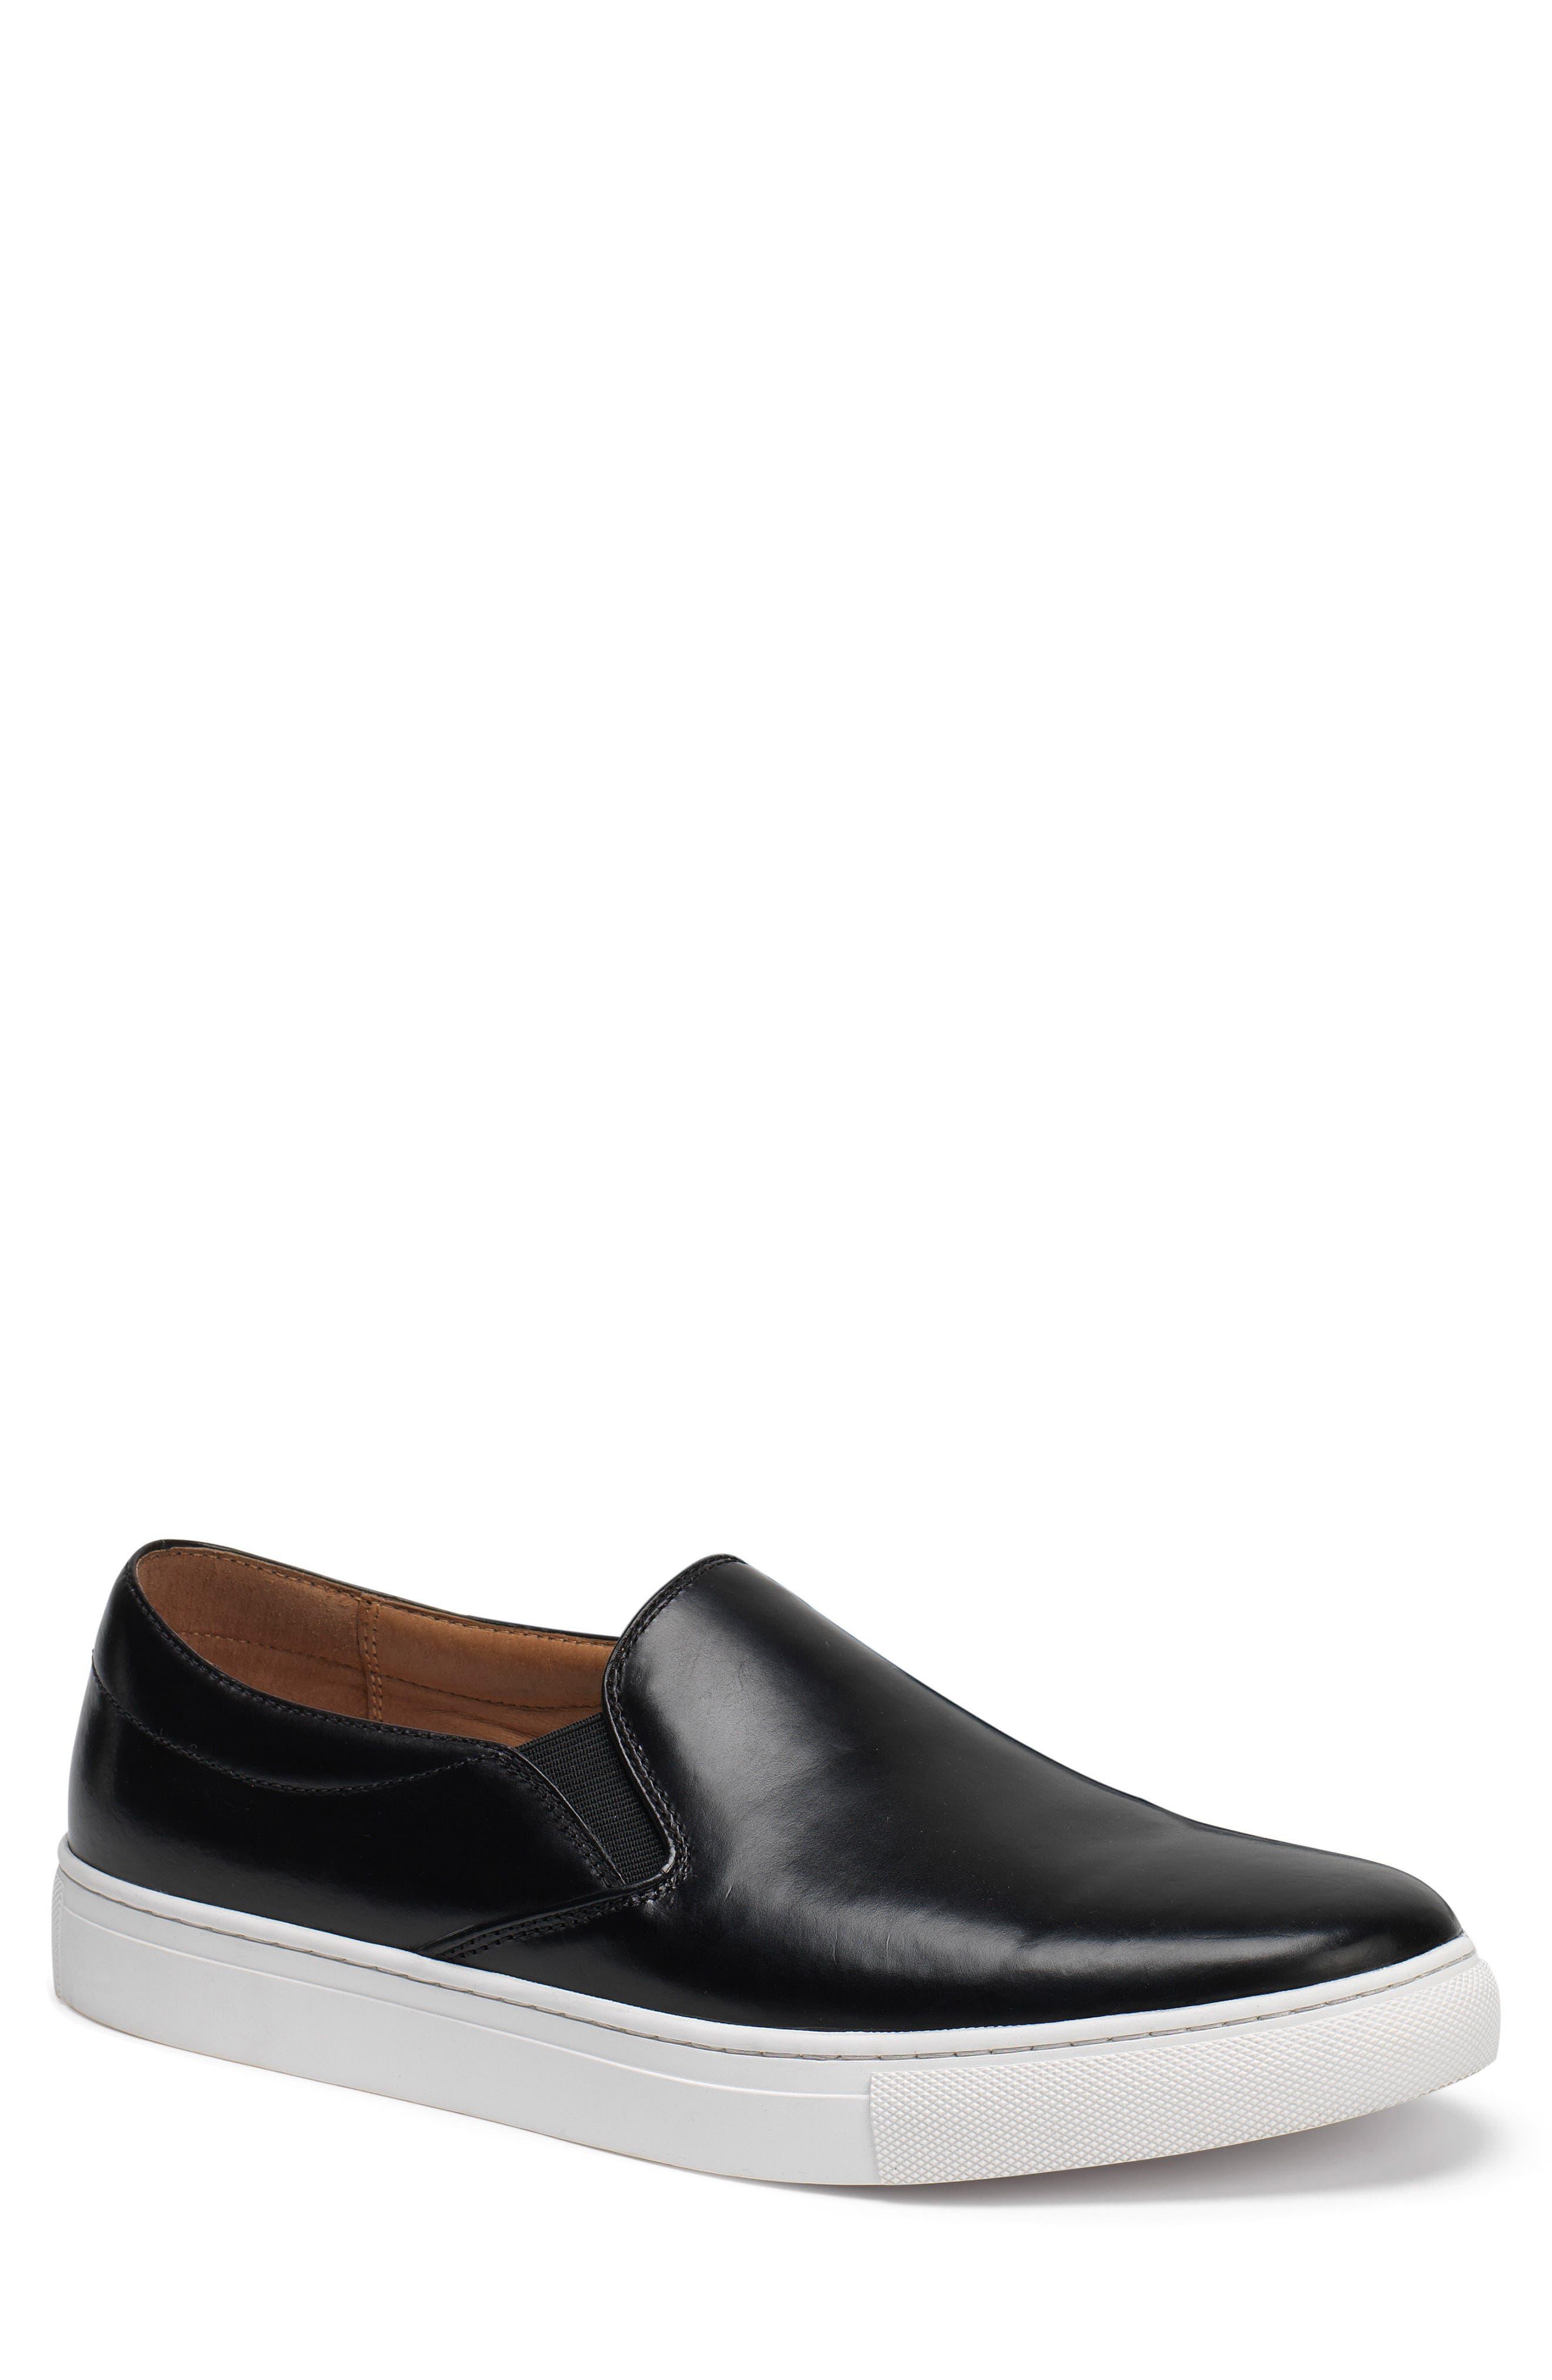 Alex Slip-On Sneaker,                             Main thumbnail 1, color,                             Black Leather